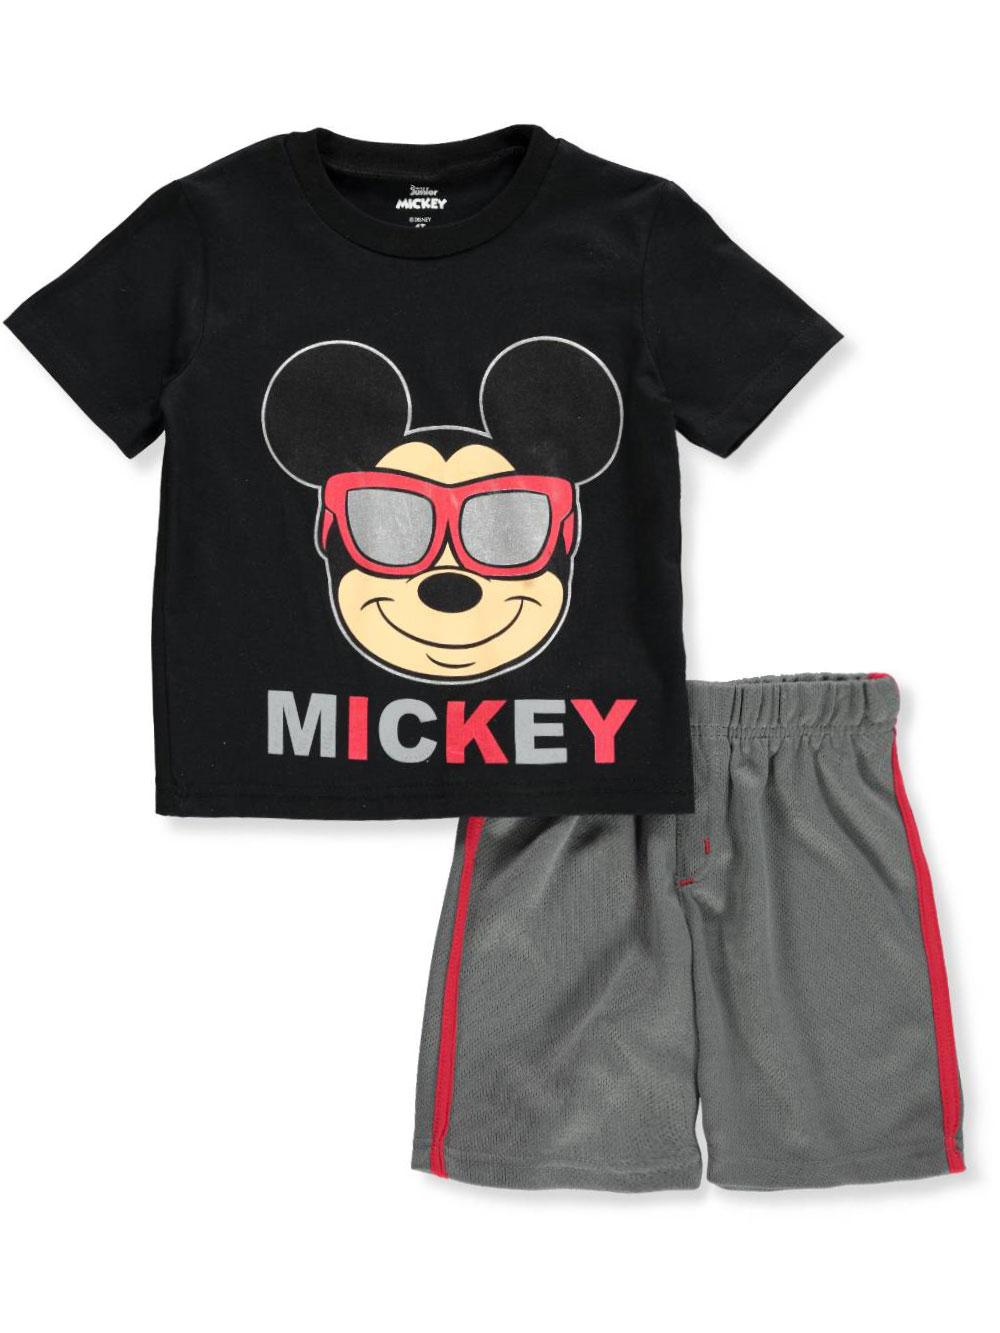 ac0e39964372ed Disney Mickey Mouse Boys' 2-Piece Shorts Set Outfit